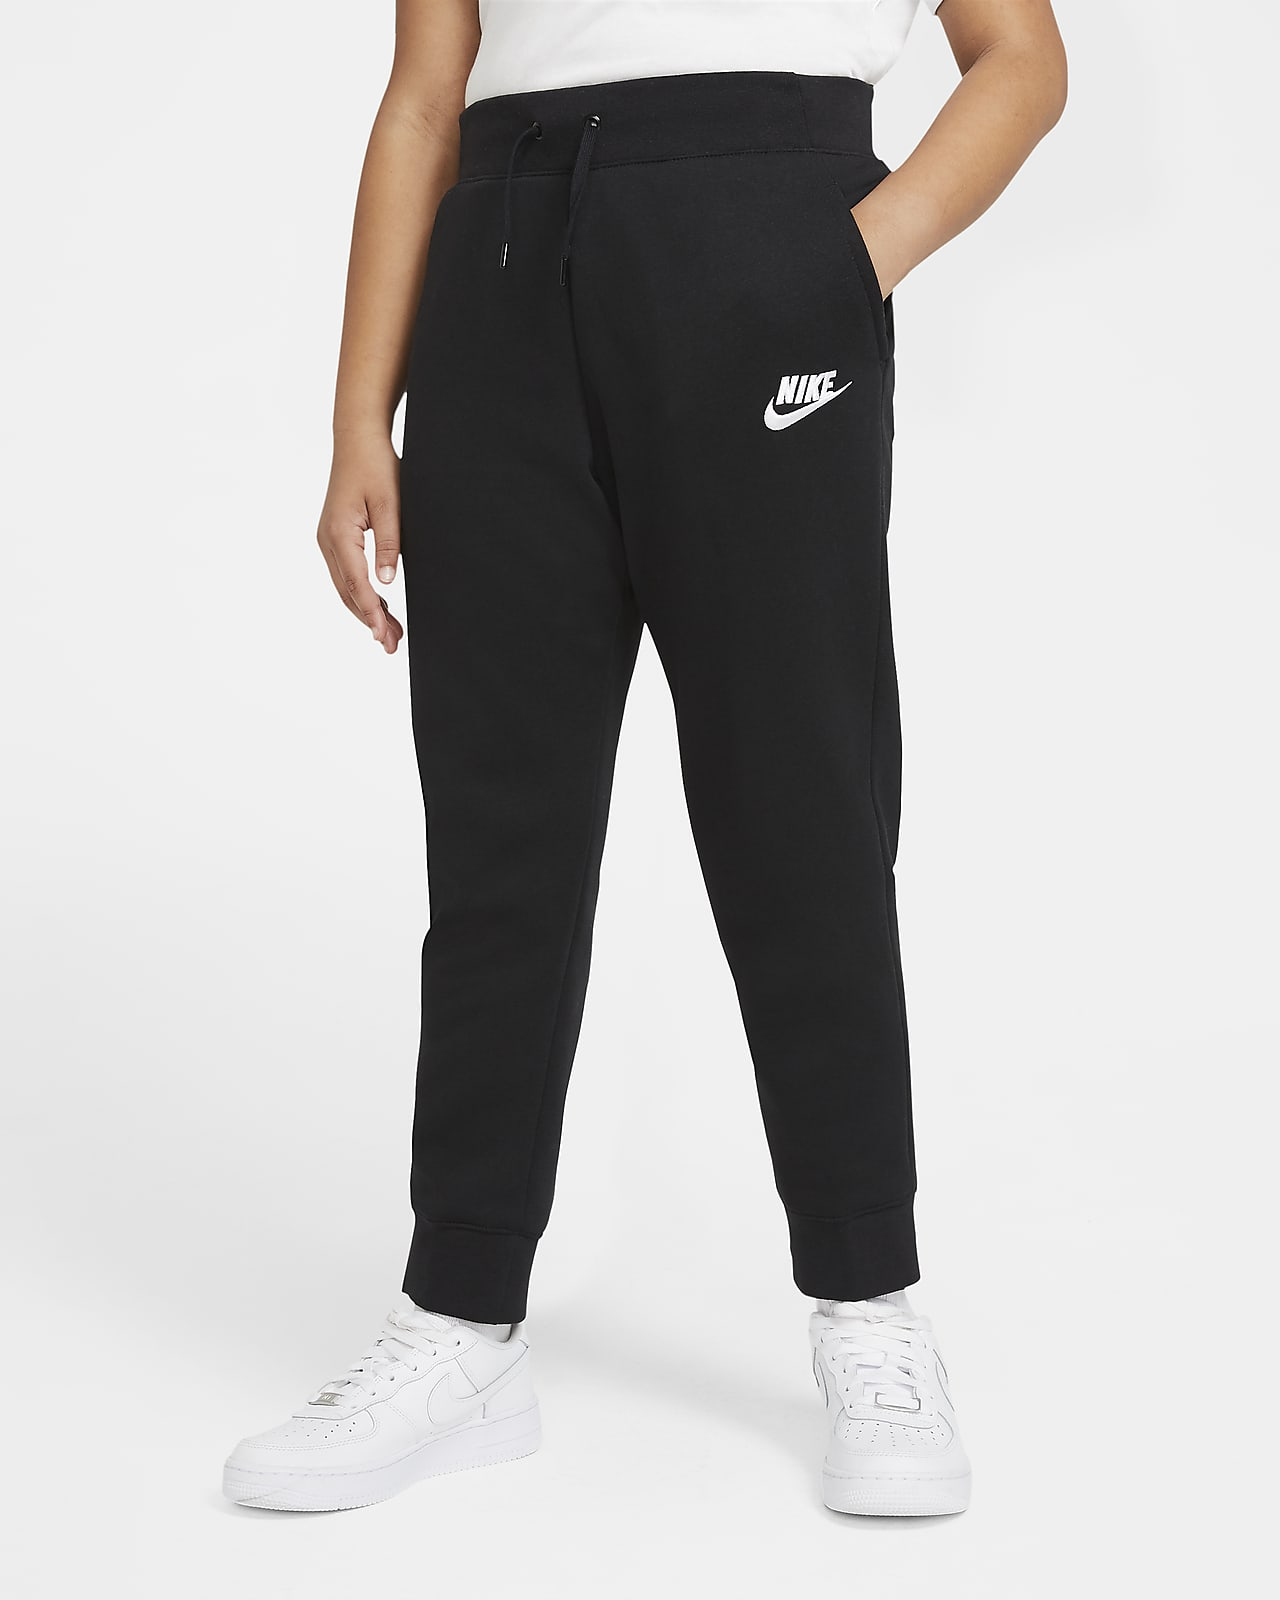 Pantaloni Nike Sportswear (Taglia grande) - Ragazza